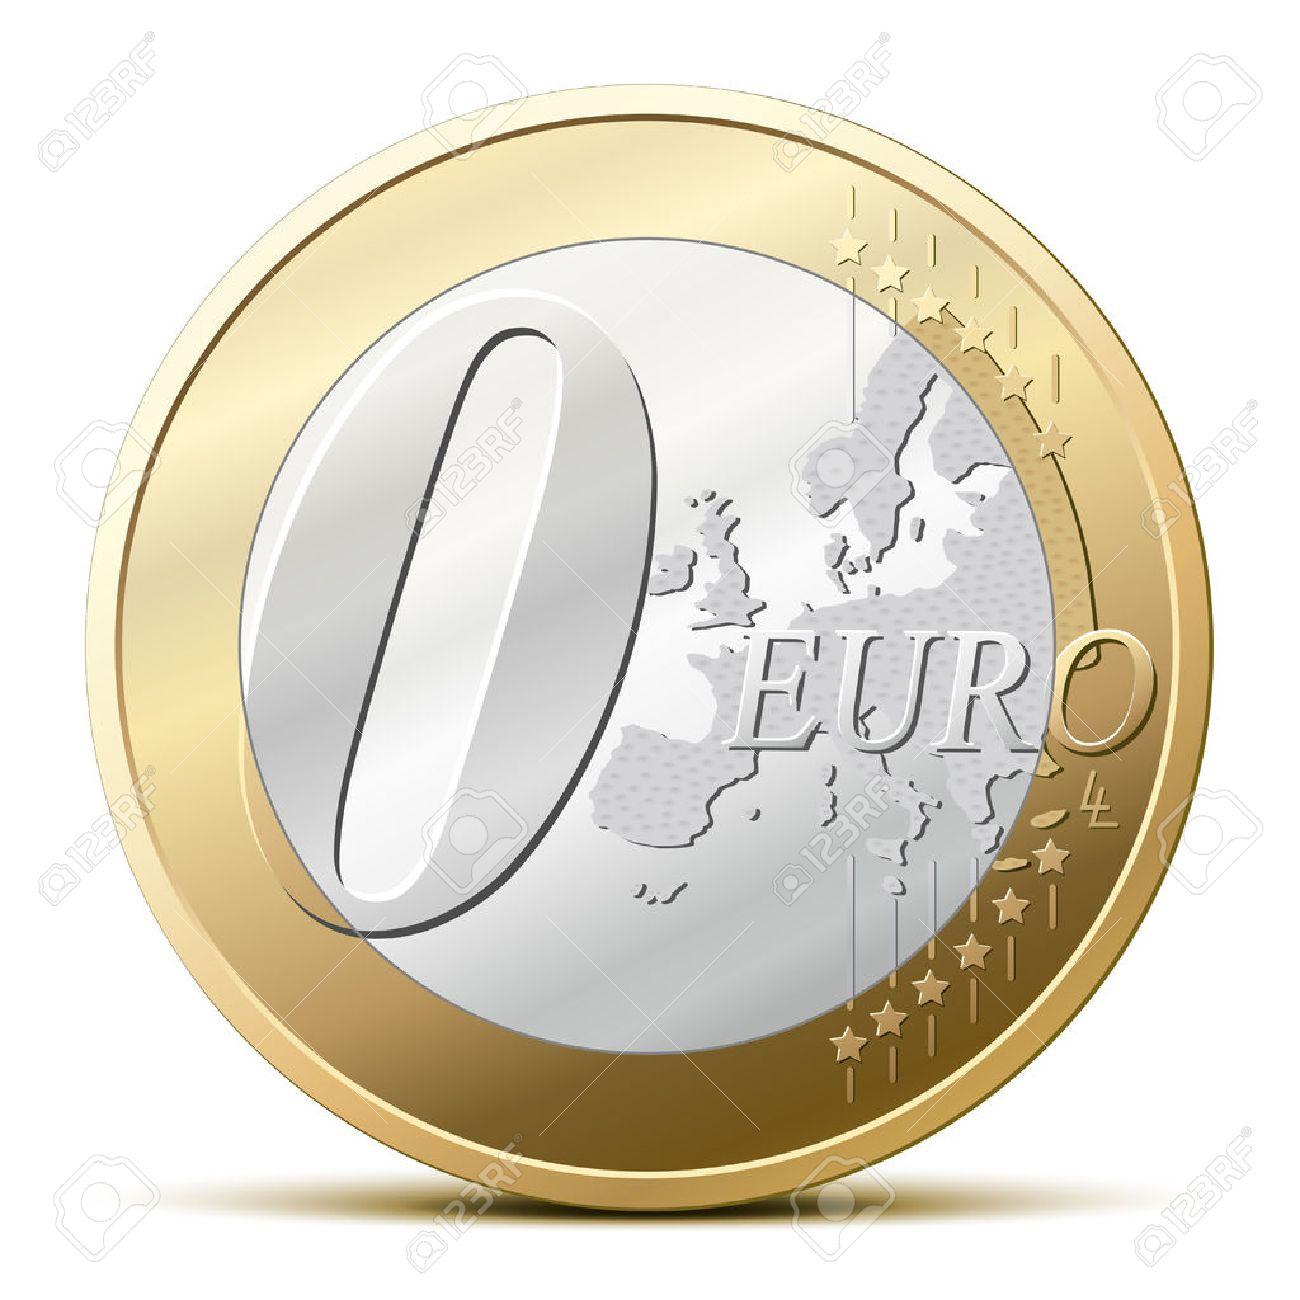 Zero euro coin, for a free item - 7116932